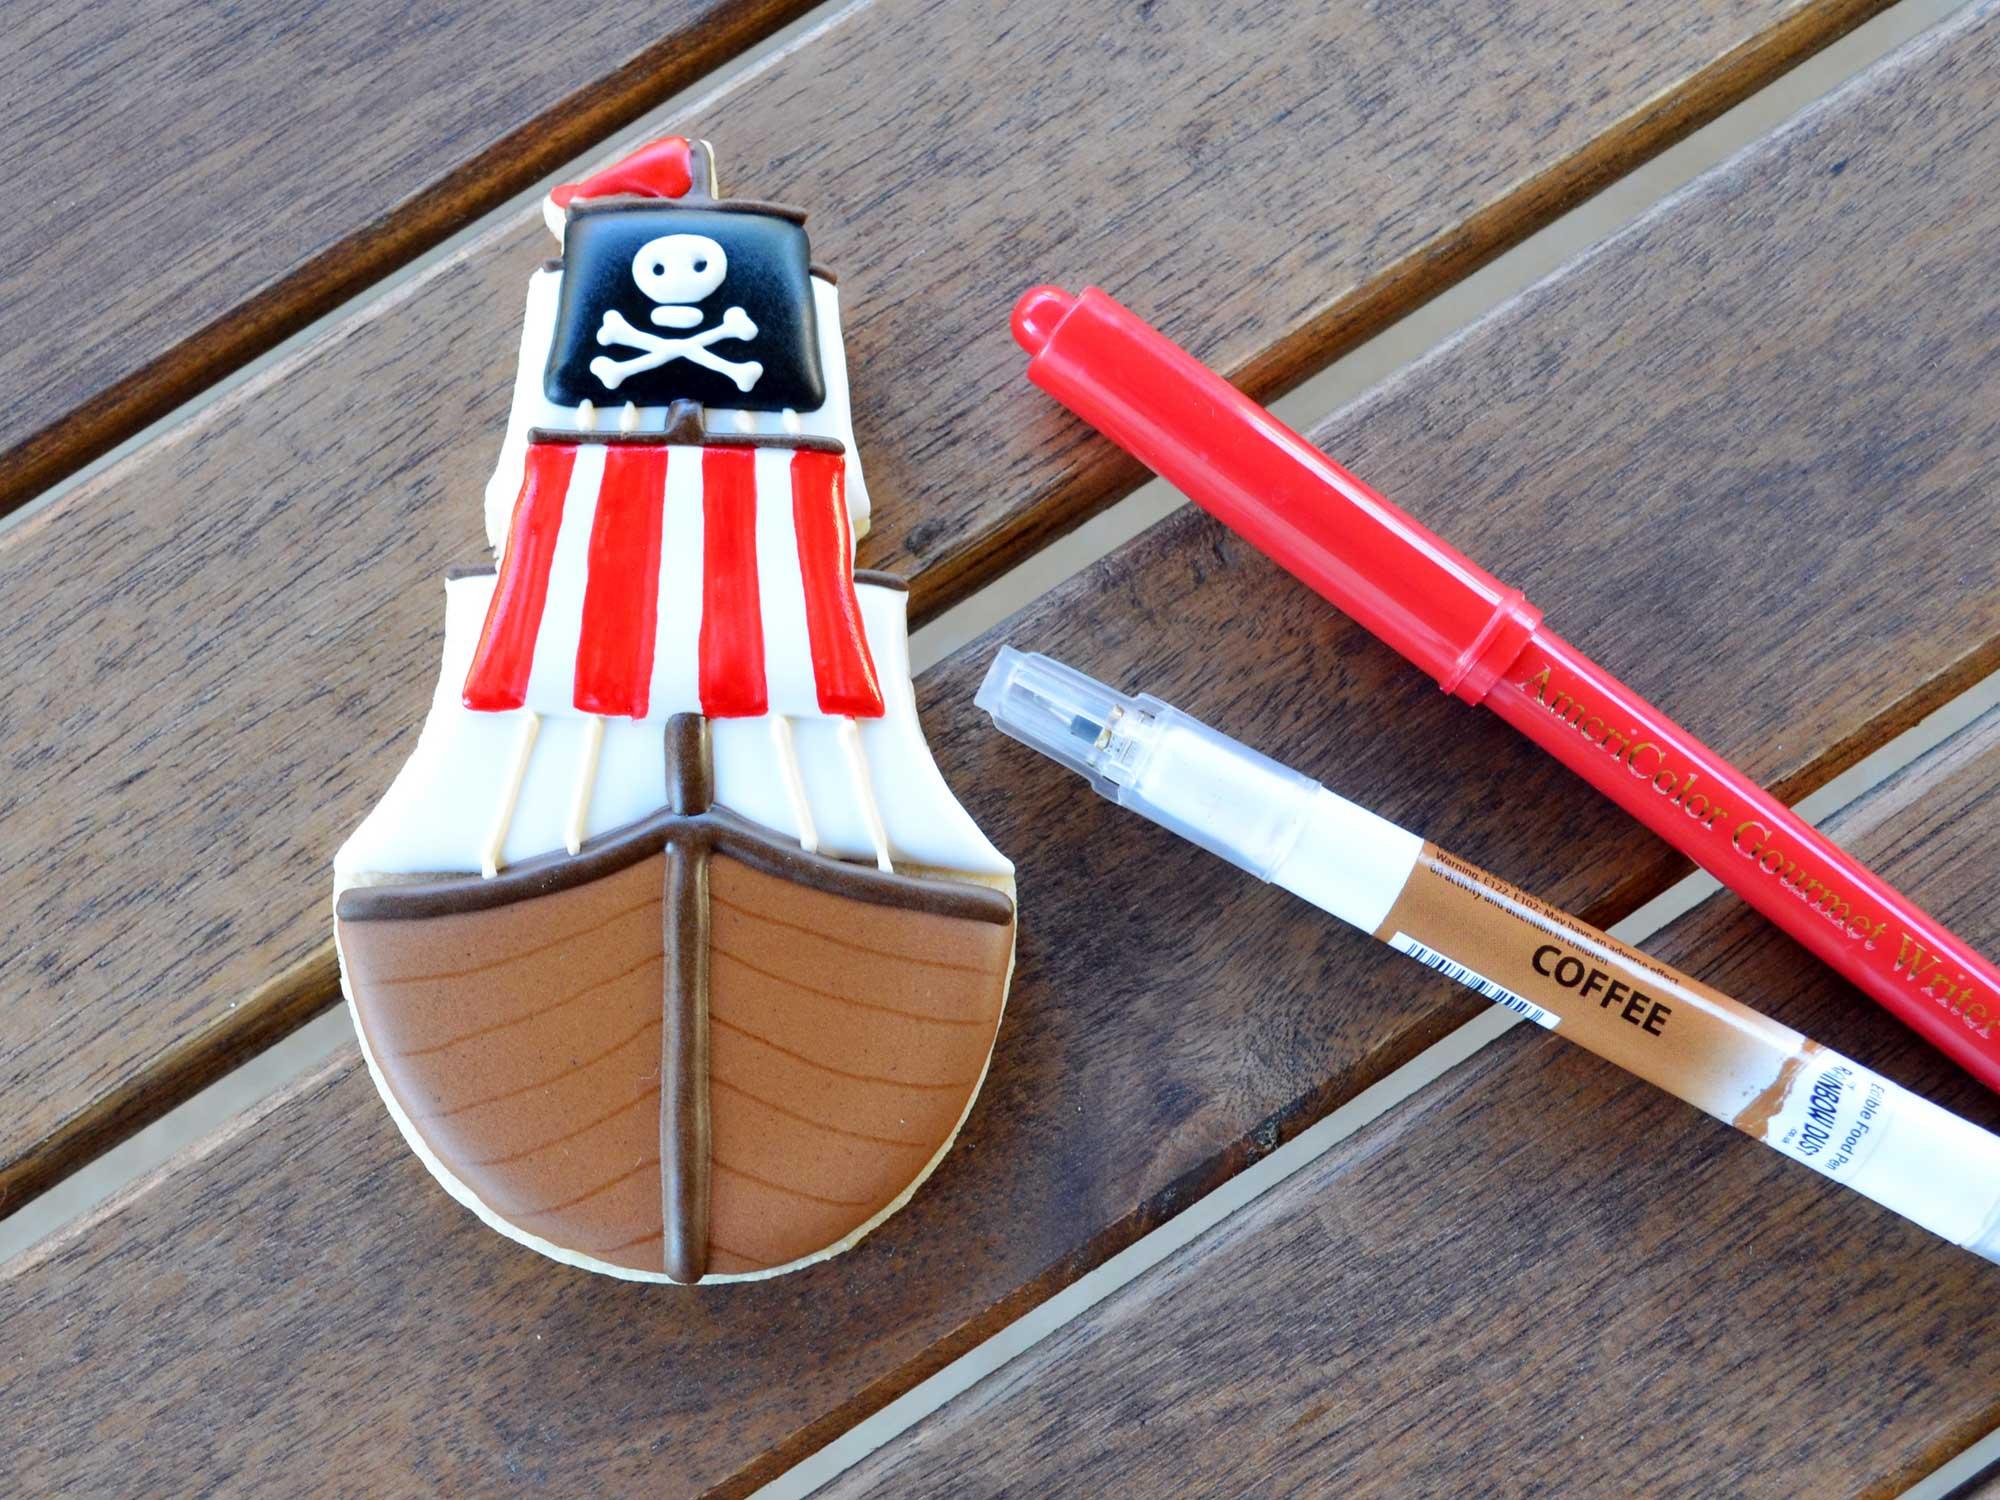 pirate ship cookies step 7